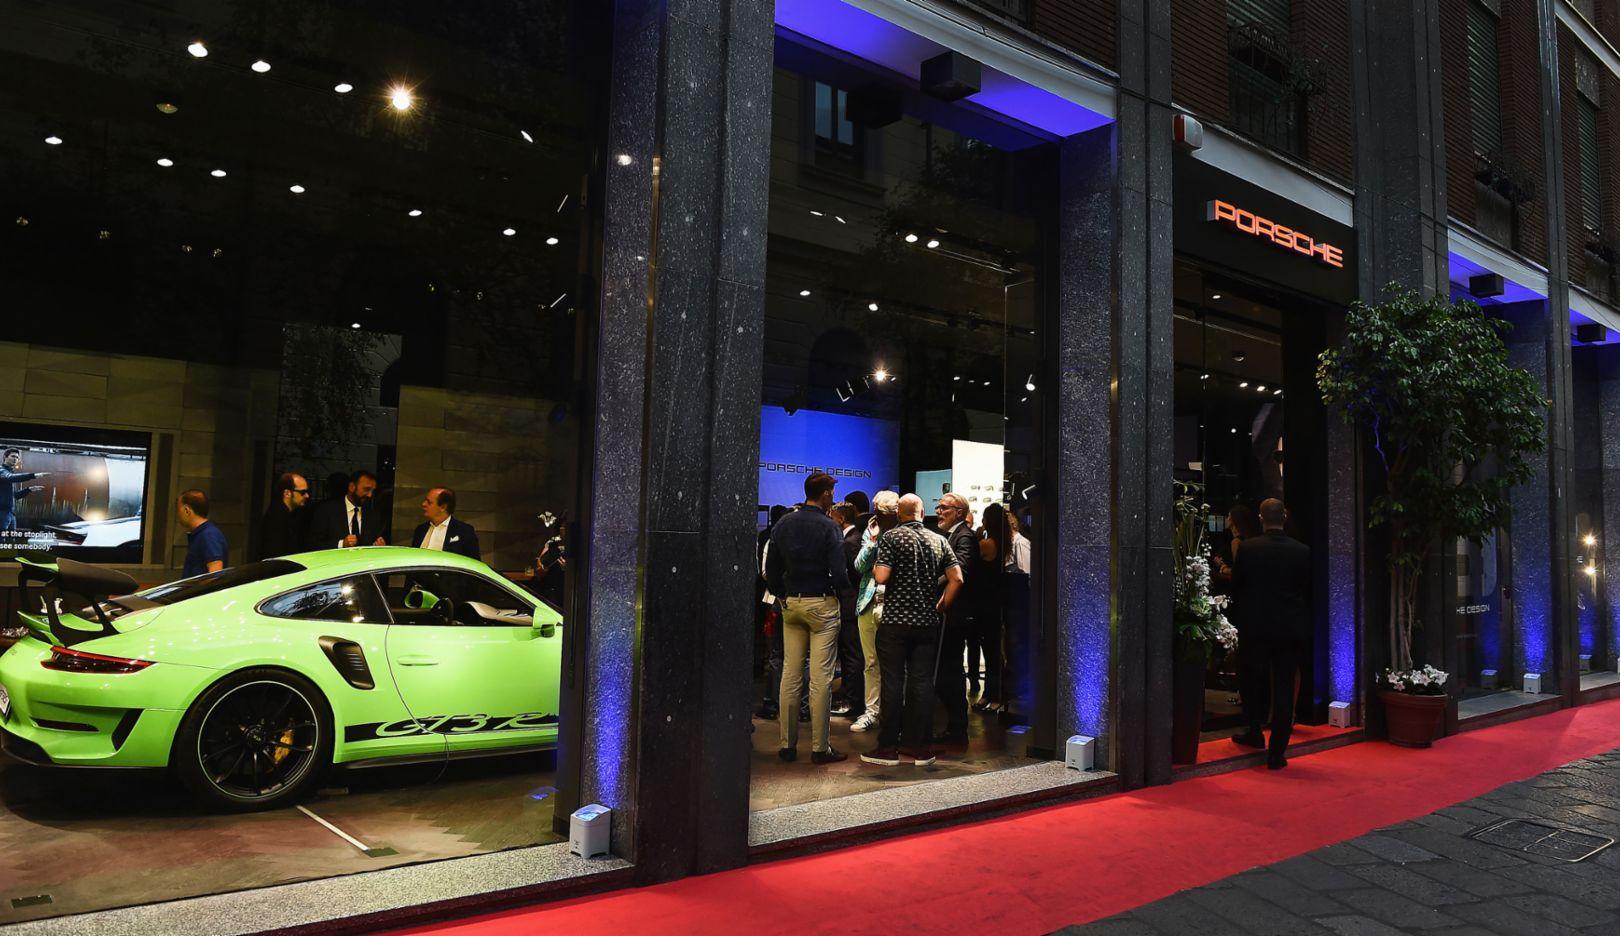 911 GT3 RS, Porsche Studio, Mailand, 2018, Porsche AG